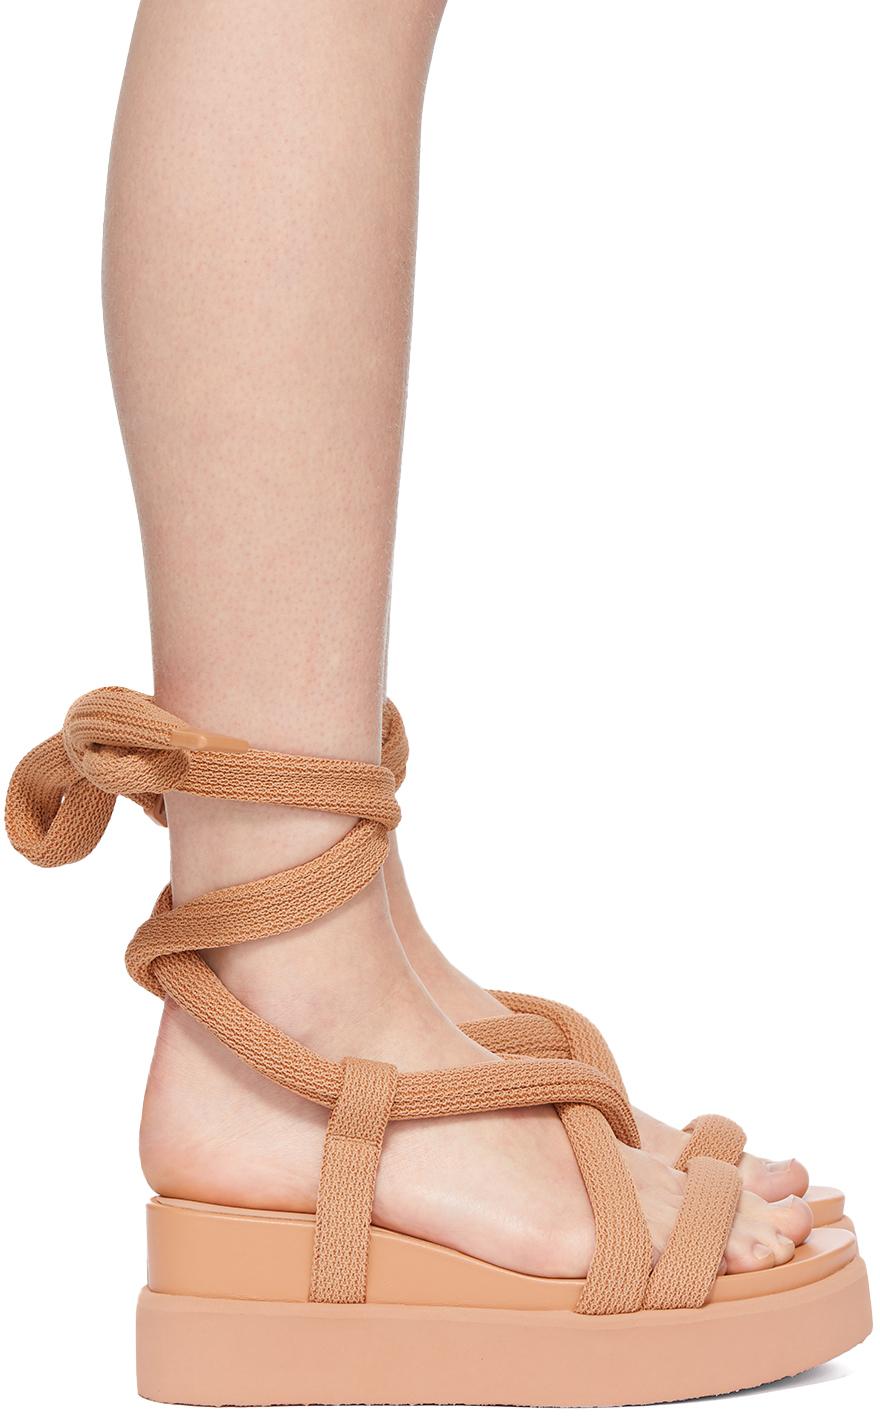 Beige United Nude Edition Node Sandals